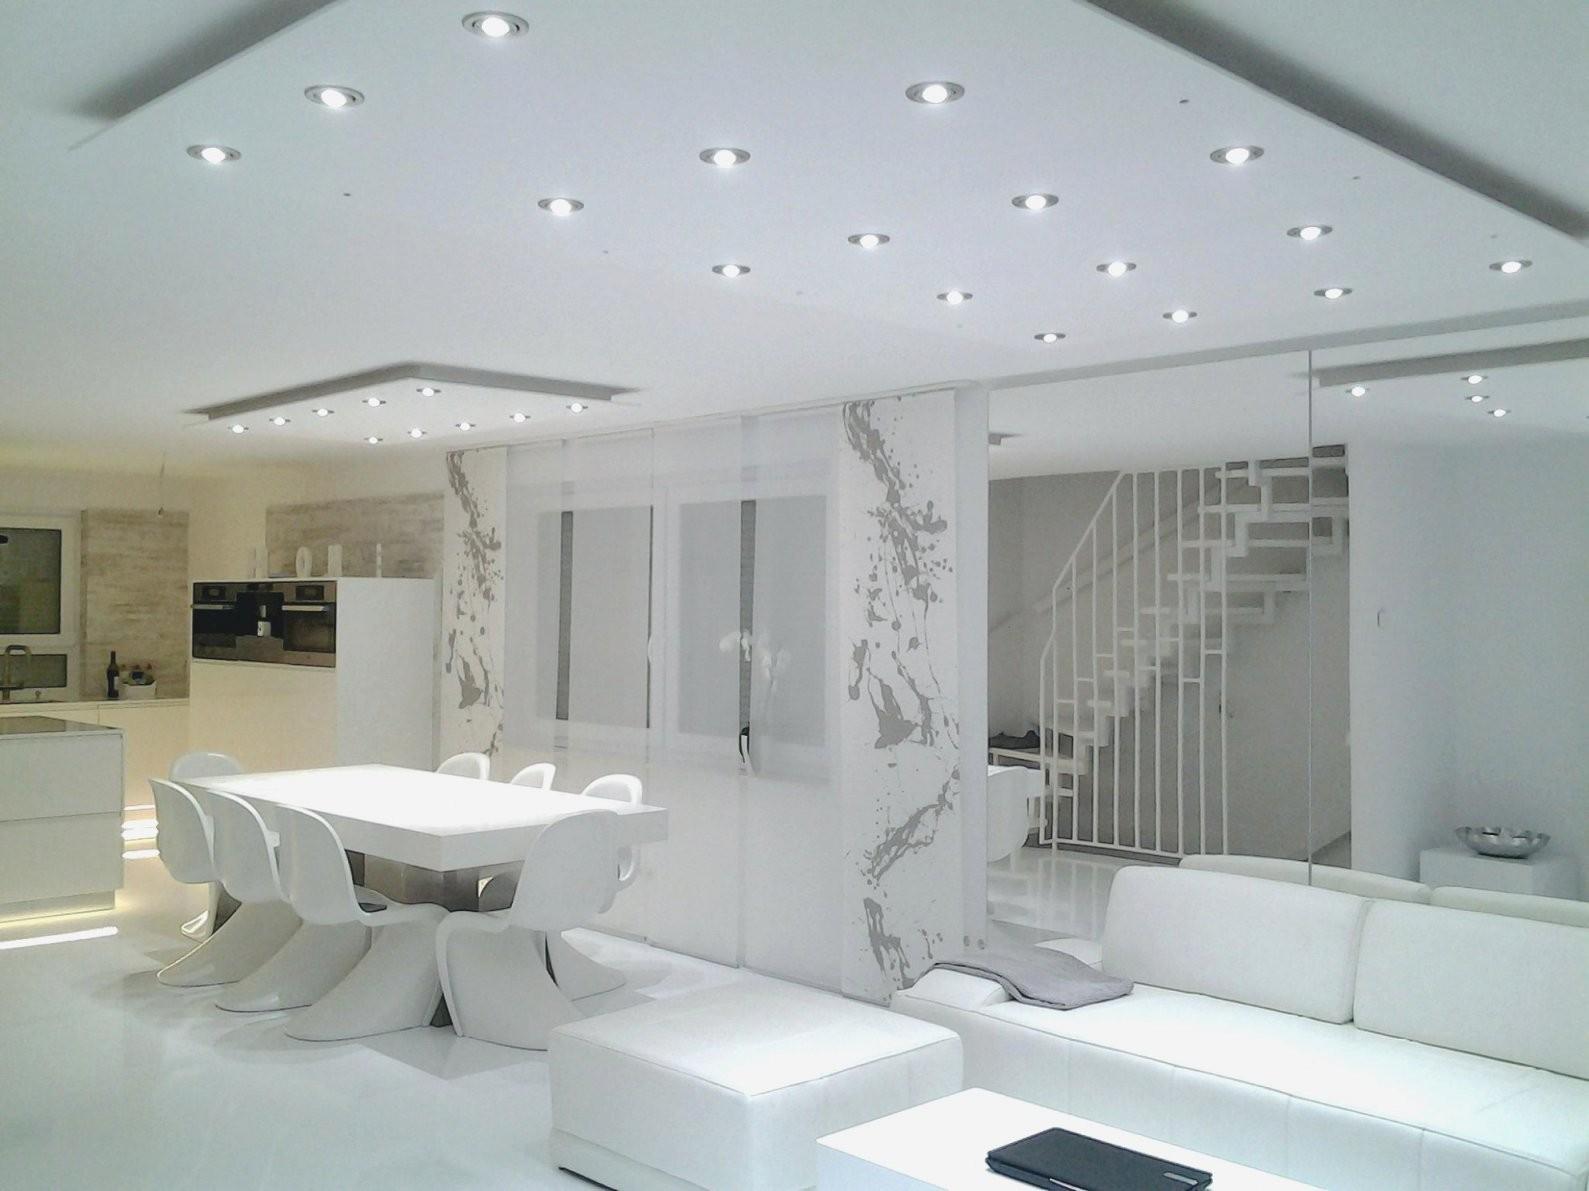 Anordnung Led Spots Wohnzimmer Fotos Großartig Led Spots Decke von Led Spots Decke Abstand Bild